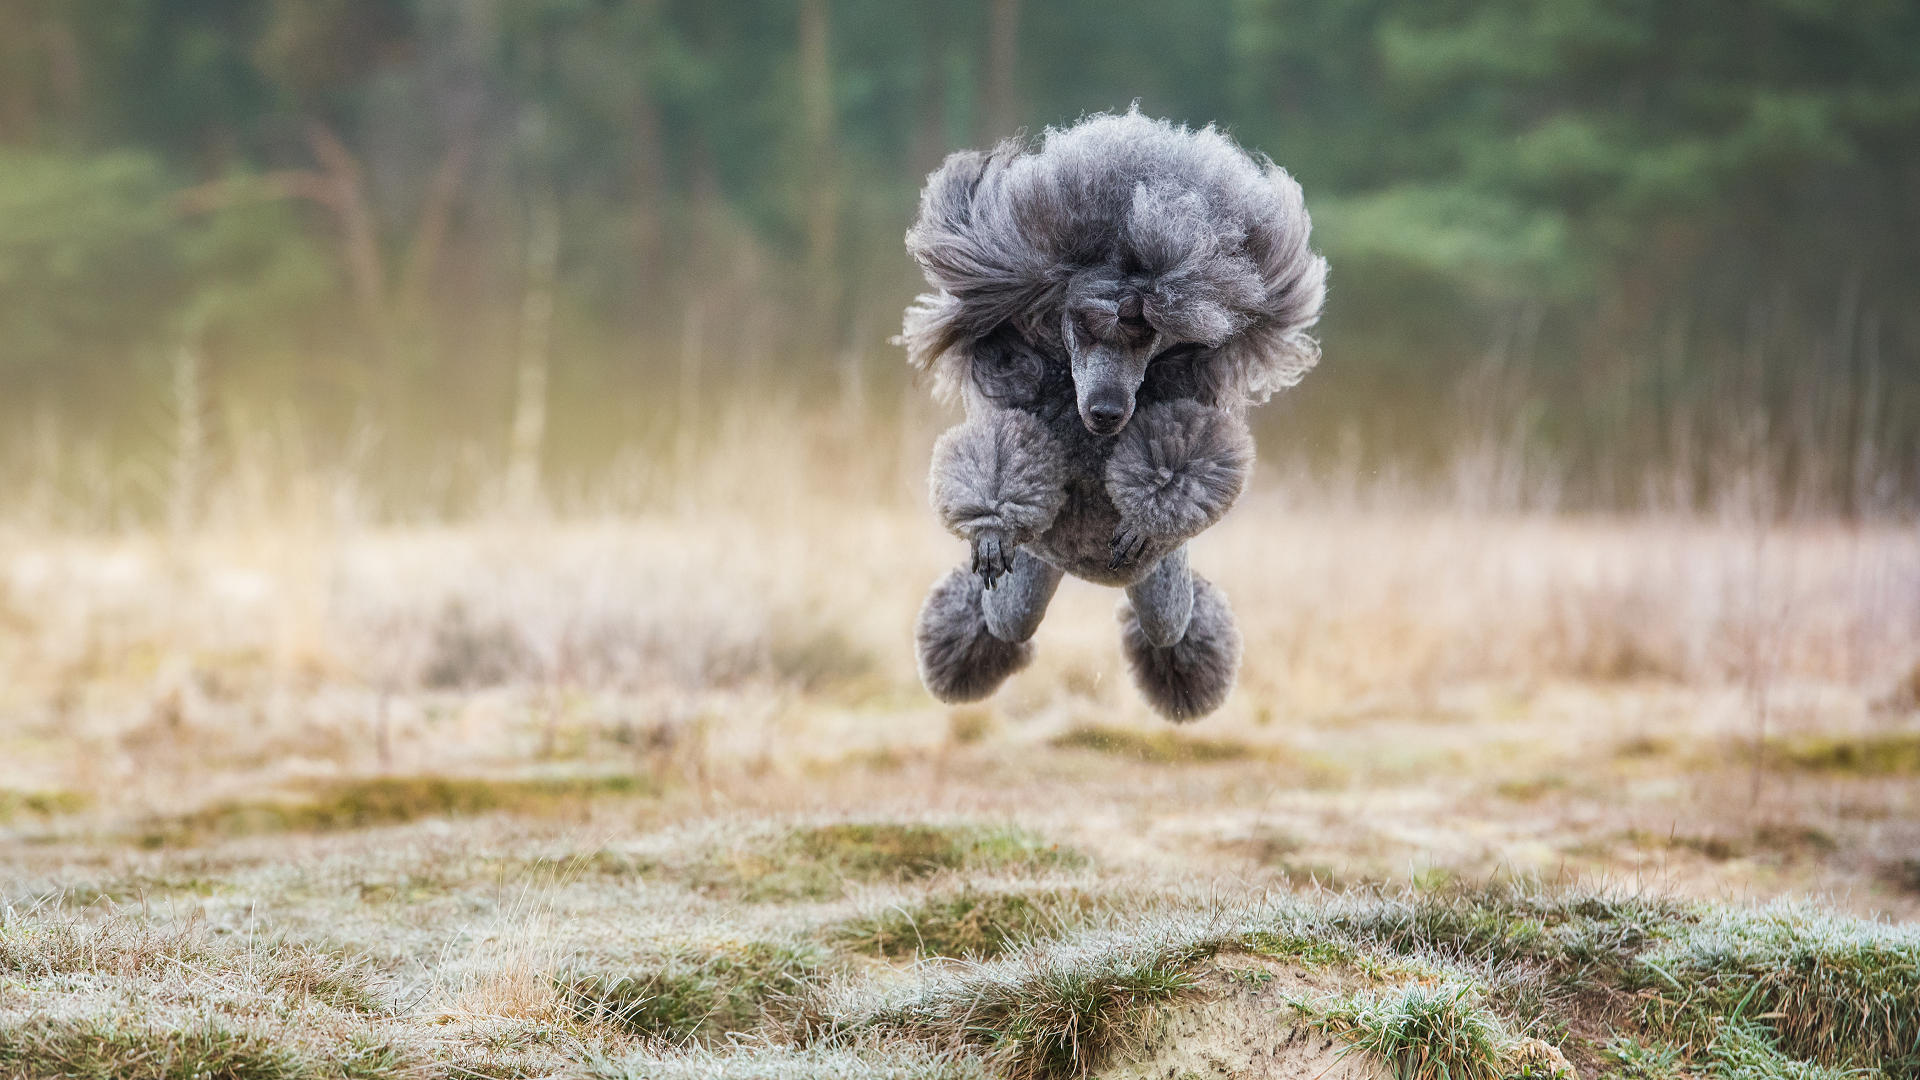 Vliegende-poedel-Kyno-Focus-Hondenfotografie